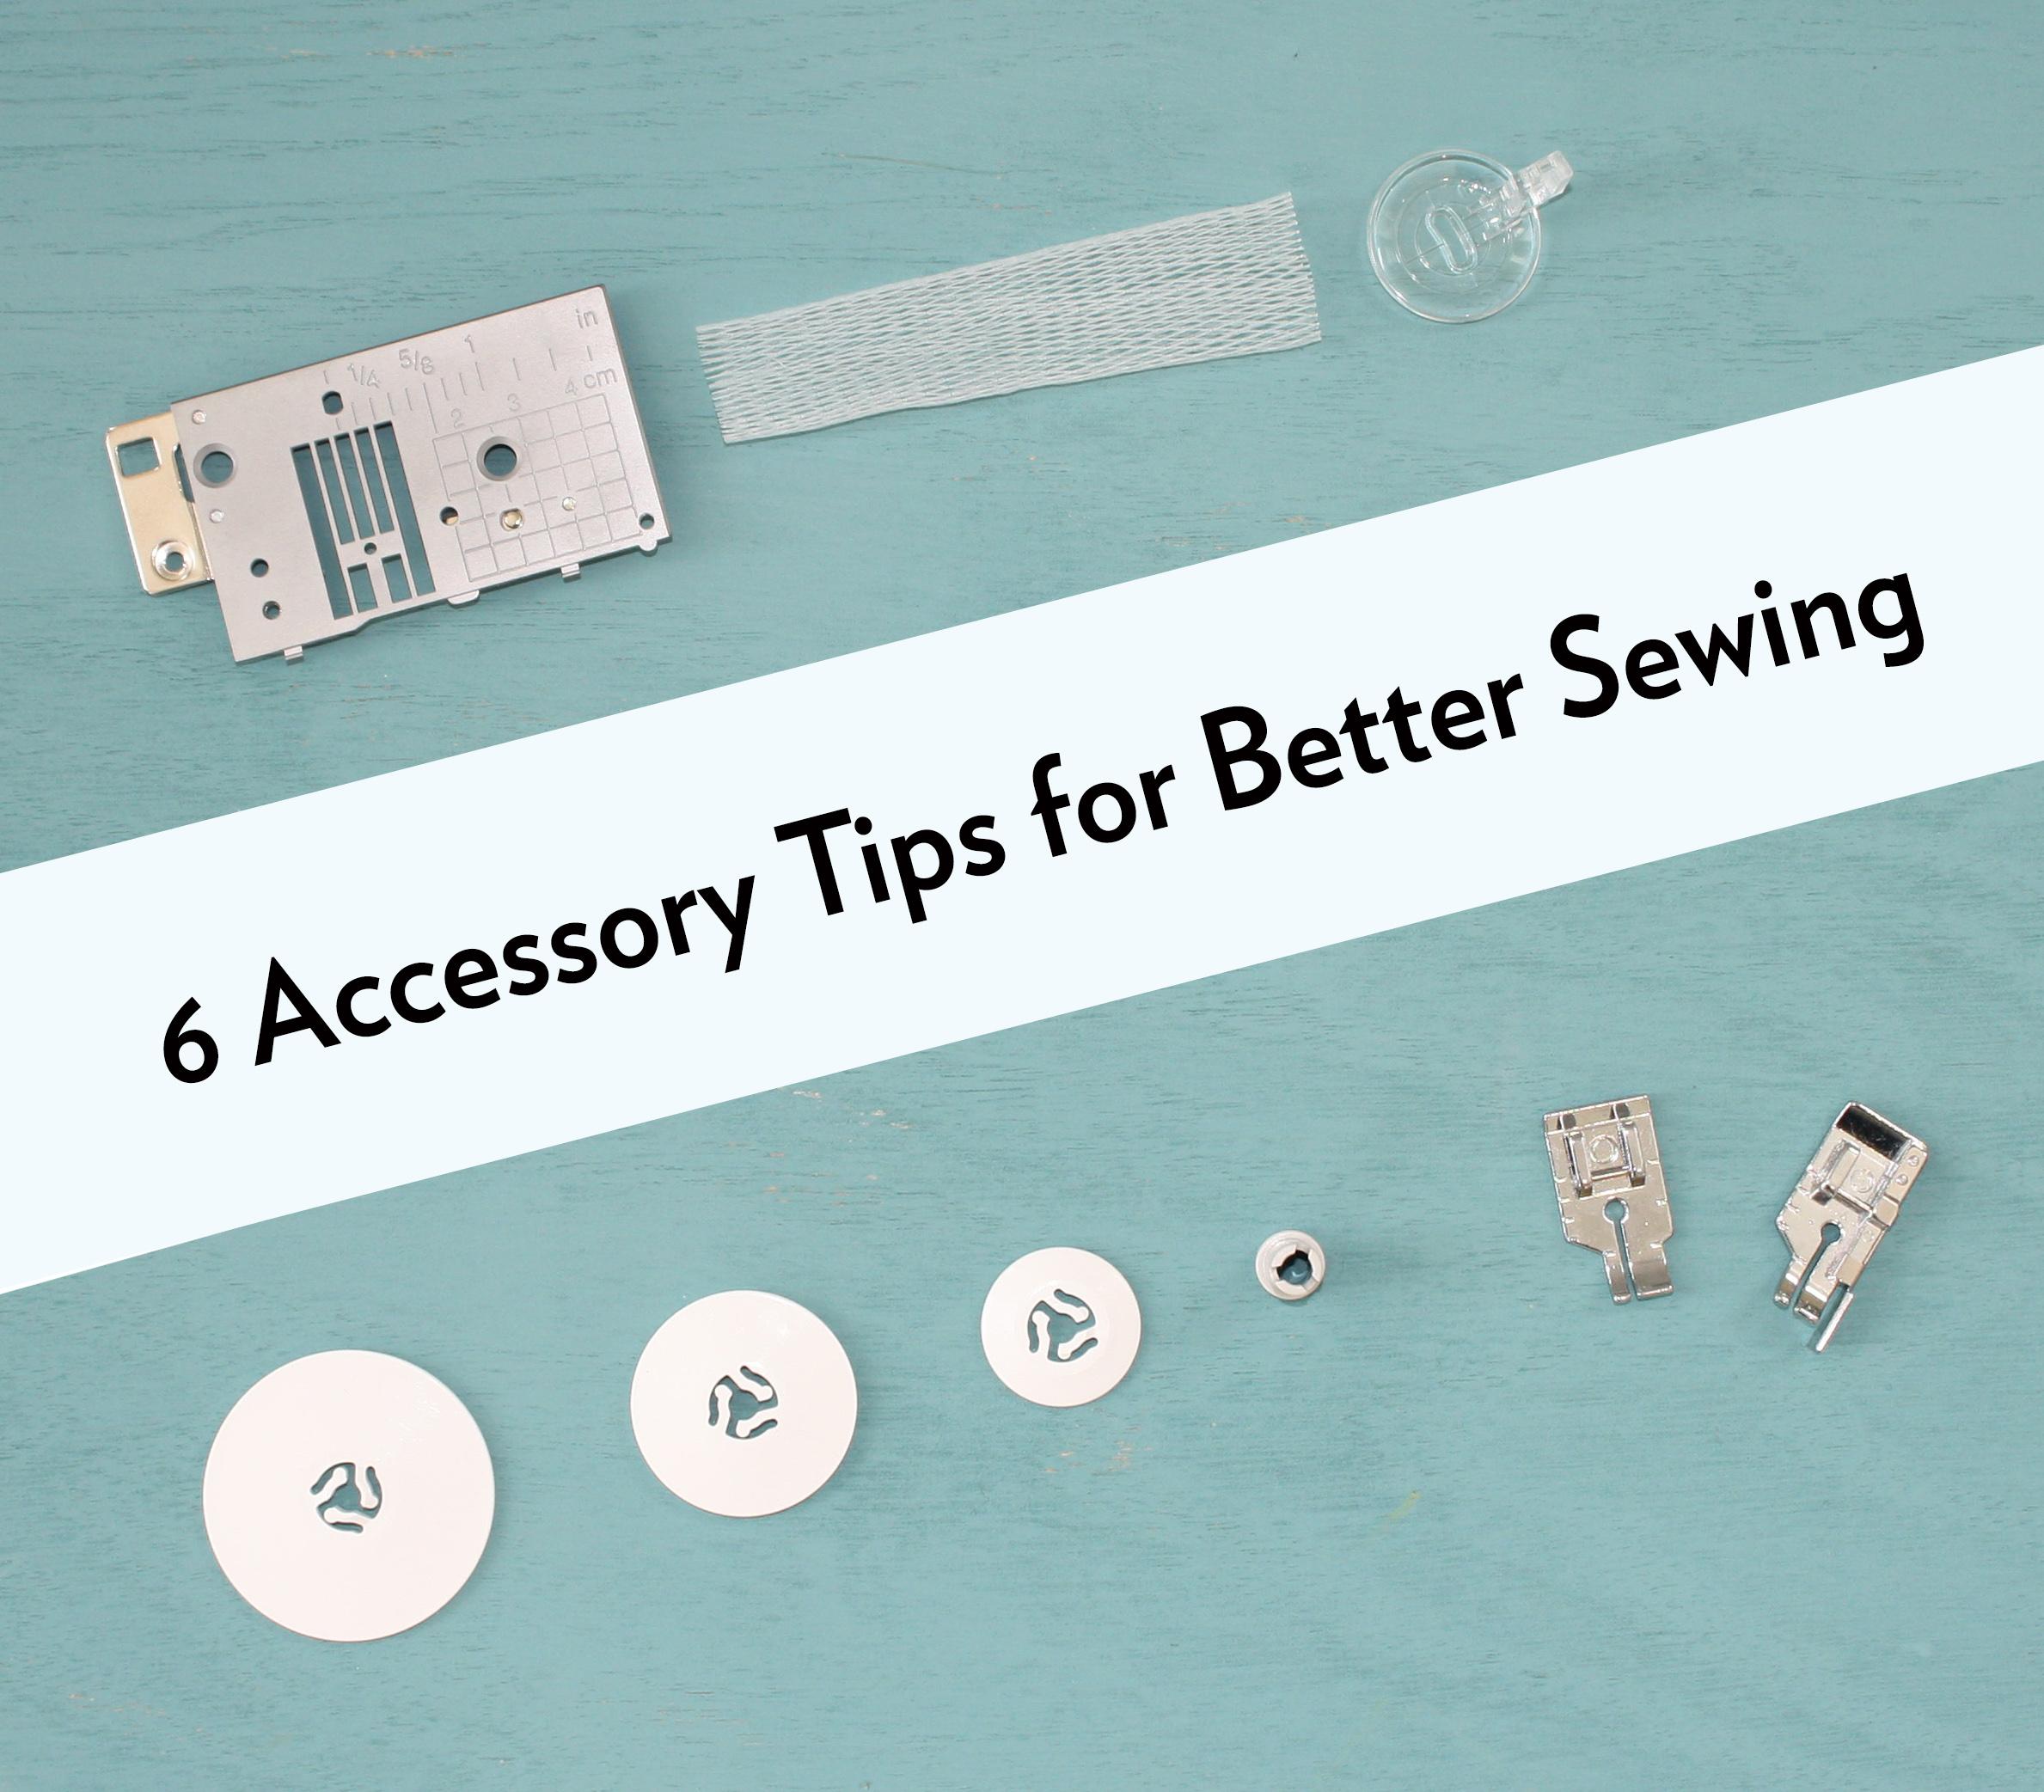 6_accessory_tips.jpg